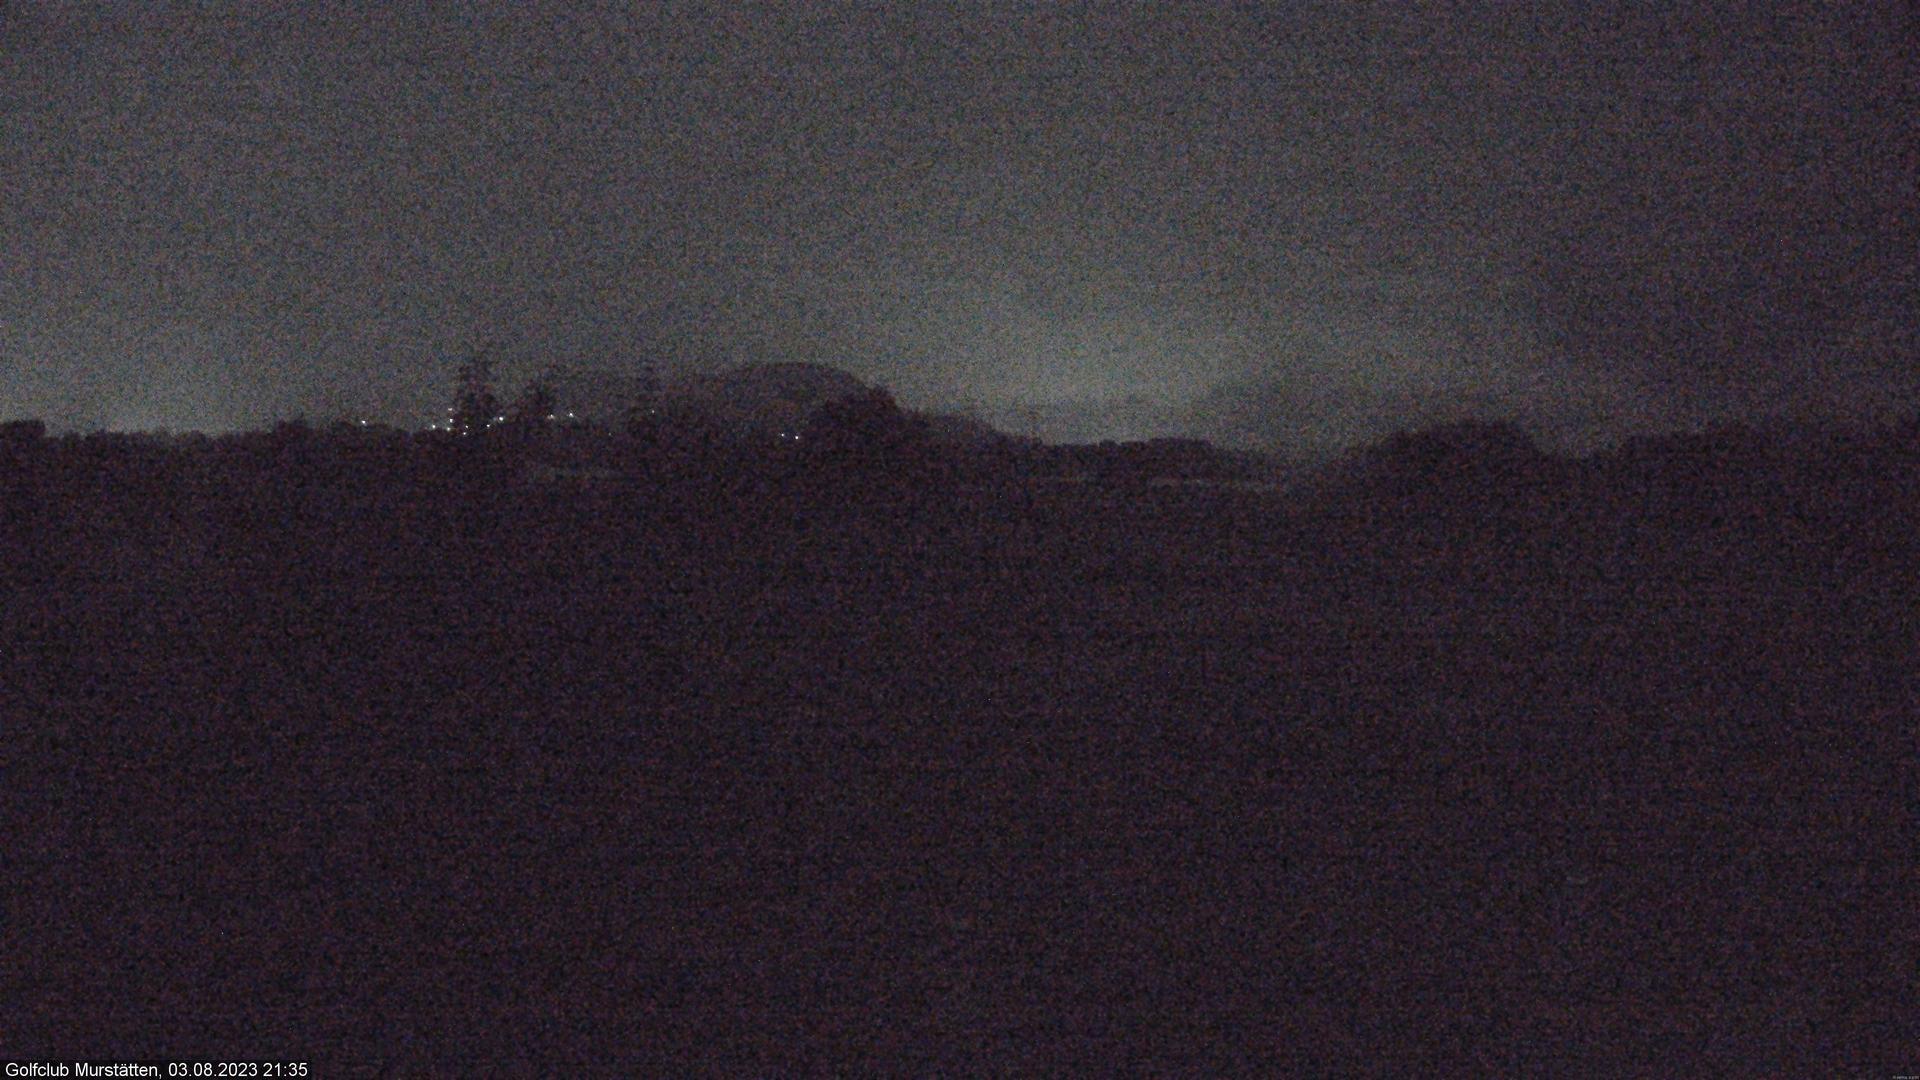 Webcam Oedt: Golfclub Murstätten